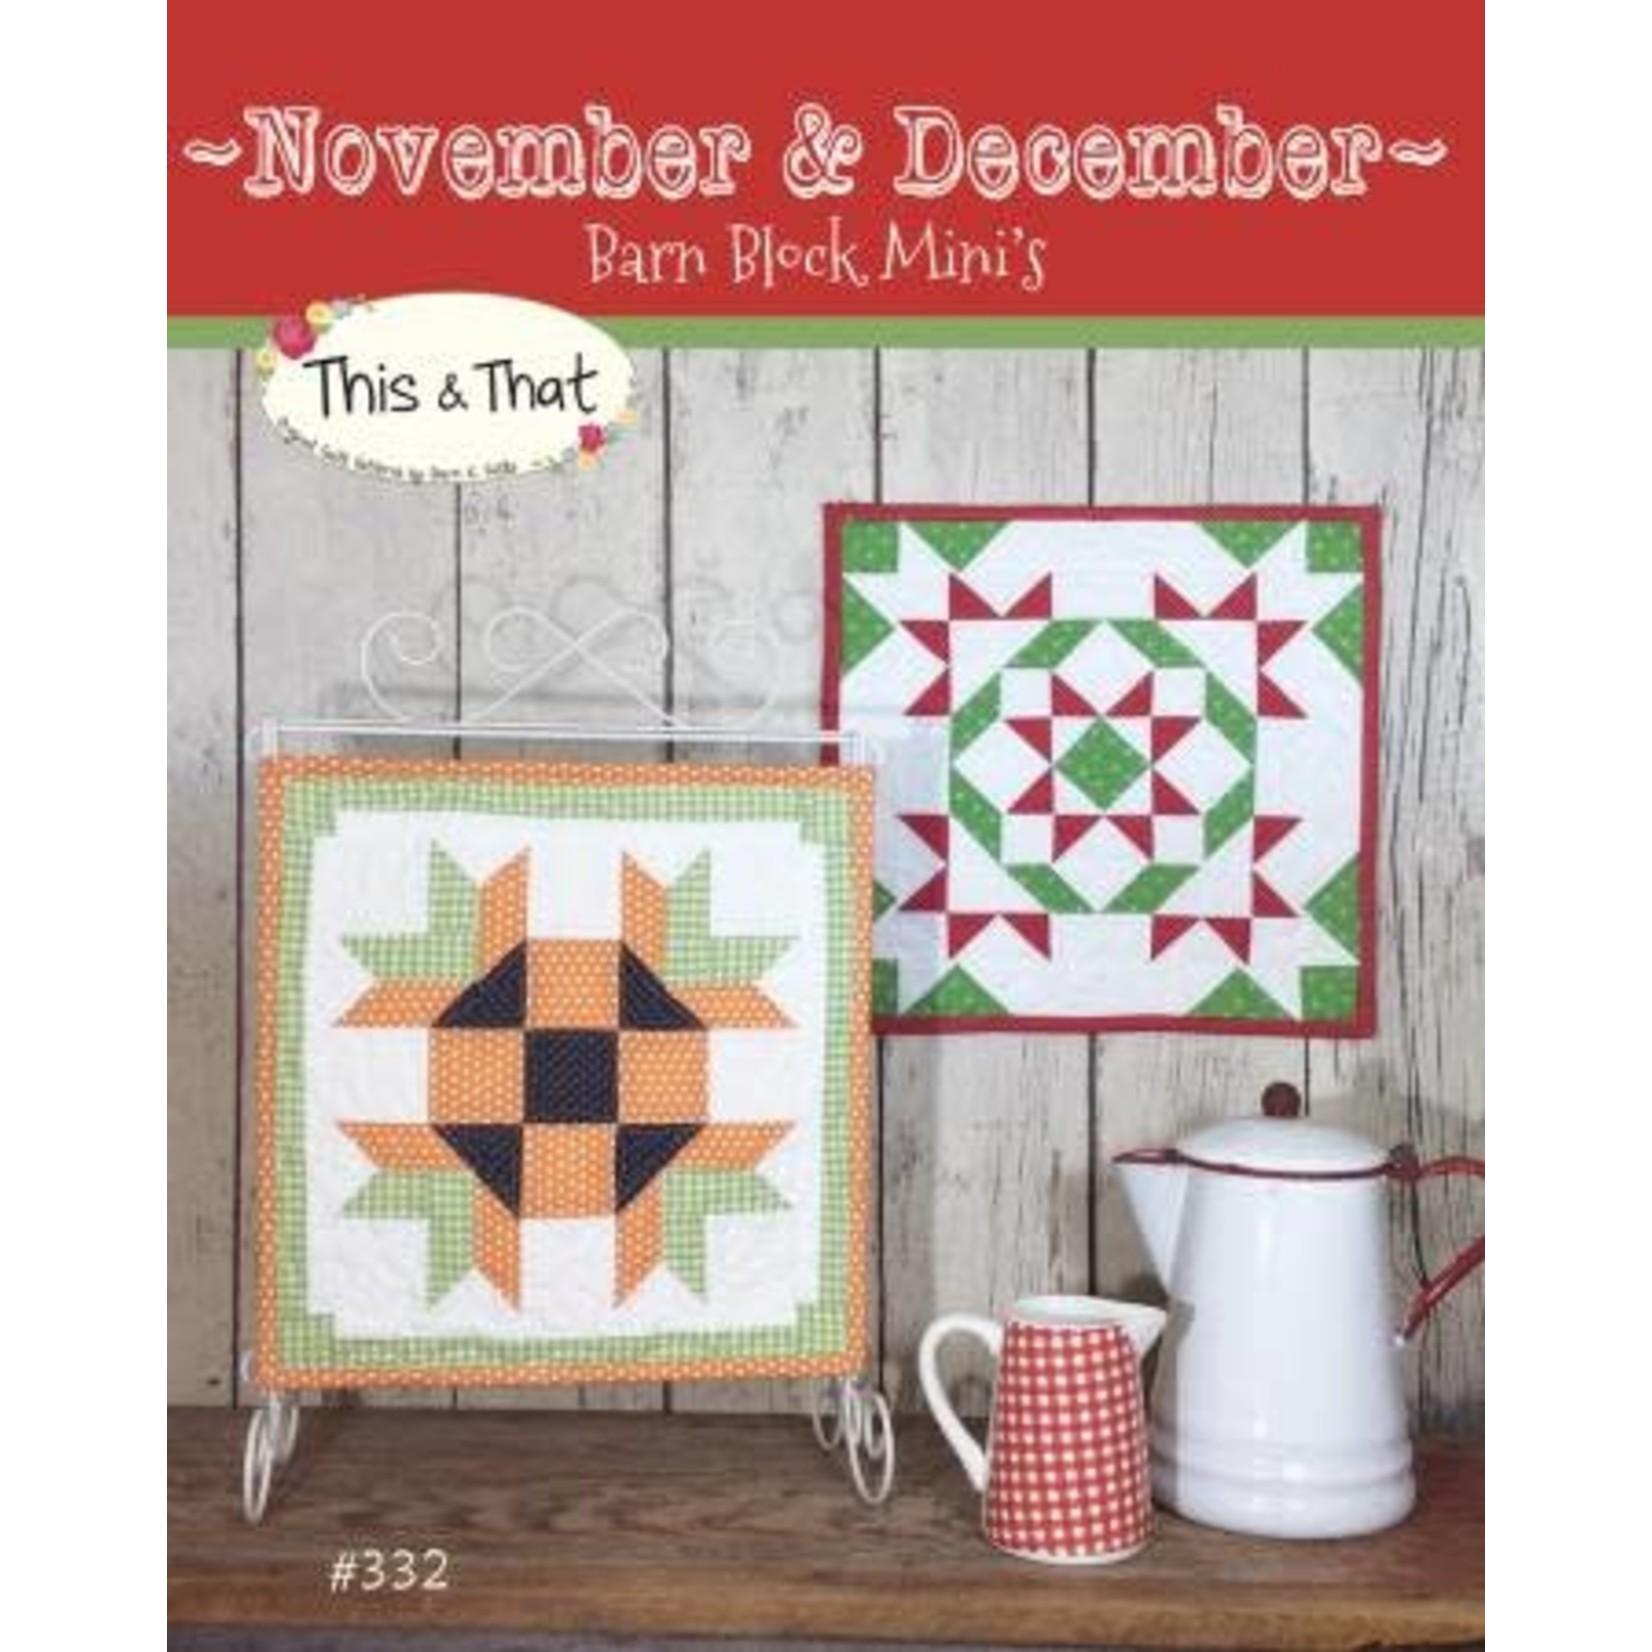 Barn Block Mini's November & December - Sherri K. Falls